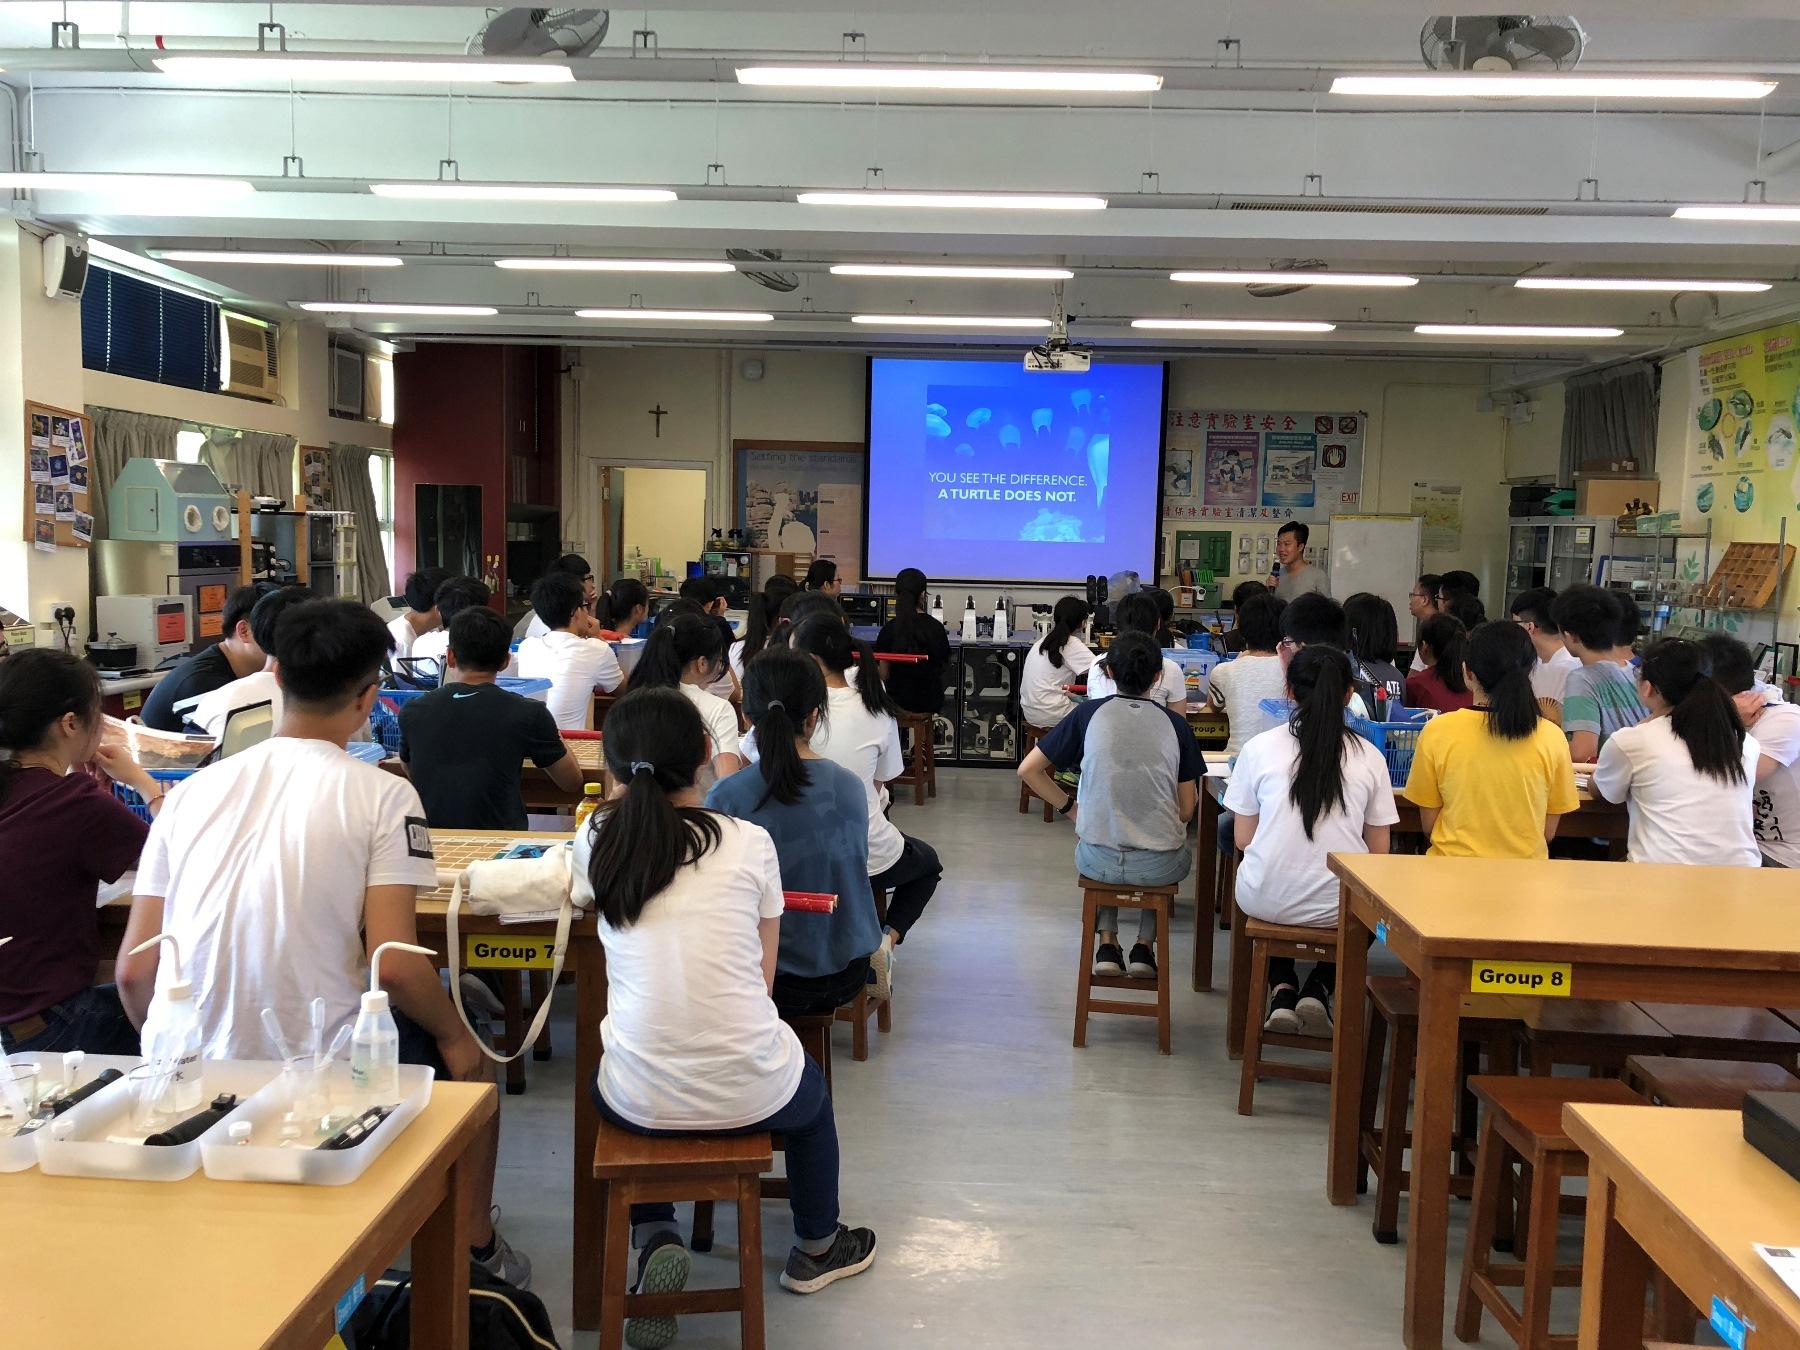 http://www.npc.edu.hk/sites/default/files/1_1458.jpg